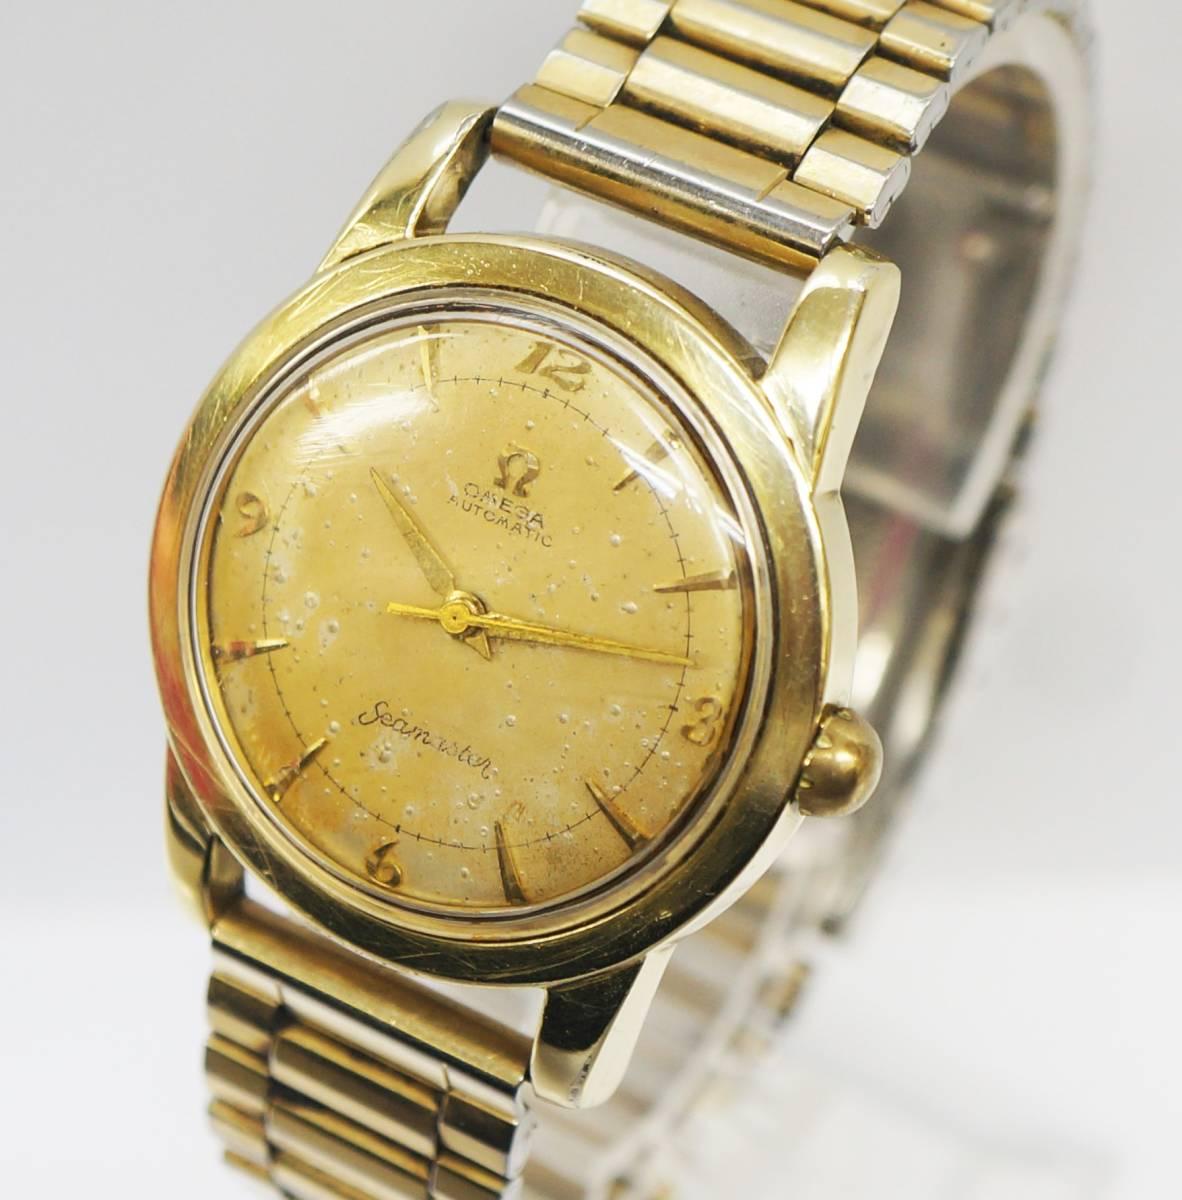 □ OMEGA オメガ Seamaster シーマスター Ref.2577-24 メンズ腕時計 自動巻き スイス製 3針 動作品 中古品 現状品 ③